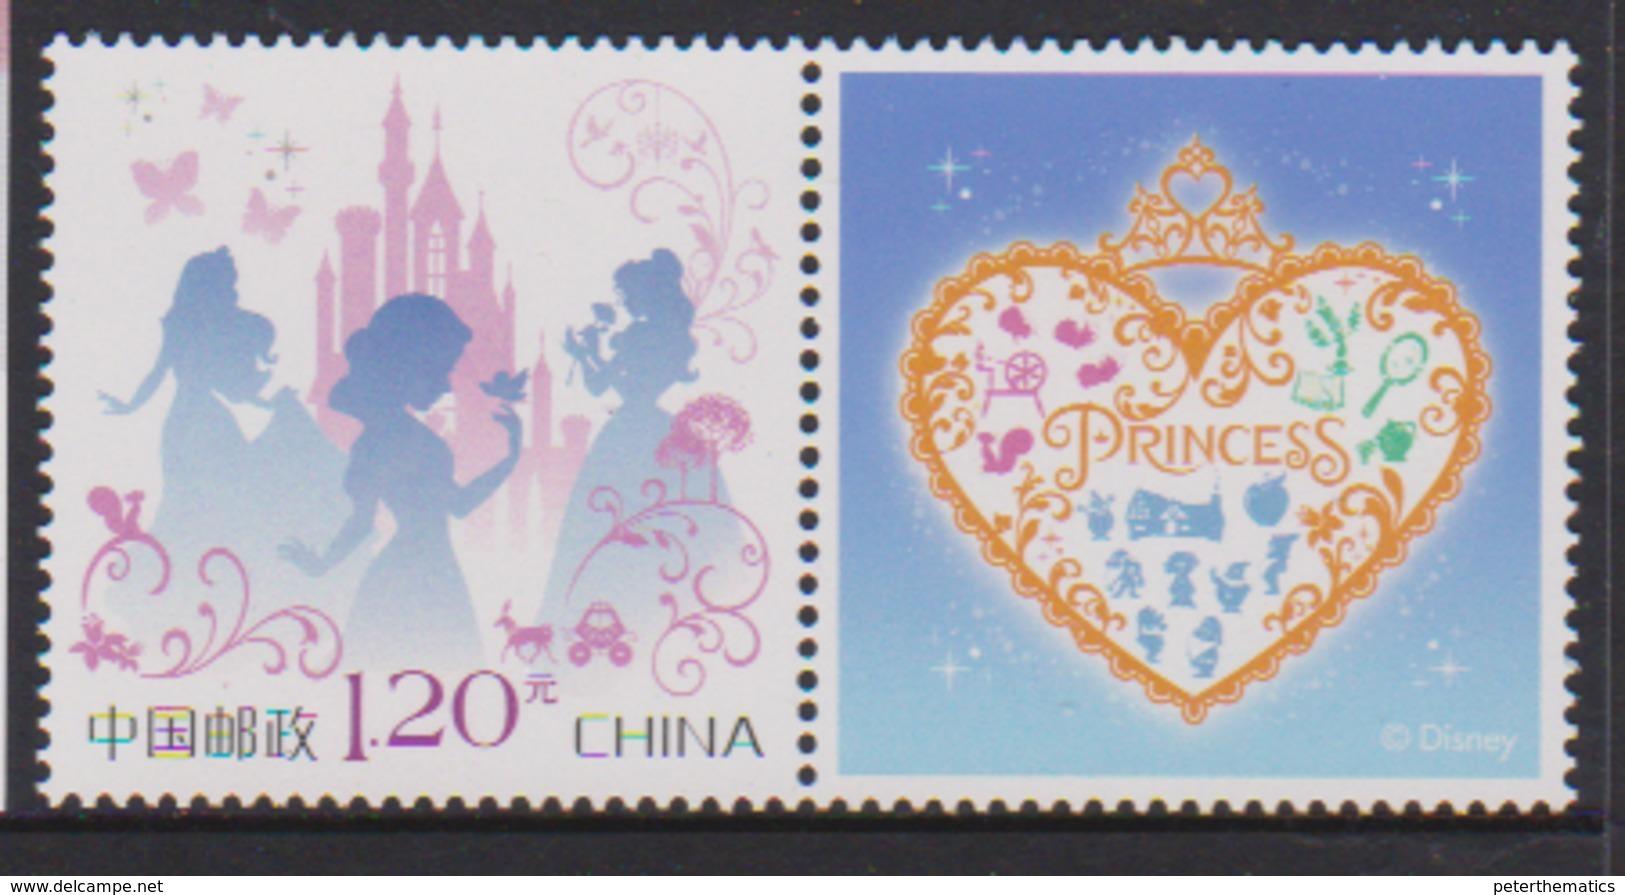 CHINA, 2017, MNH, DISNEYLAND, PRINCESS, PERSONALIZED STAMP, 1v - Disney